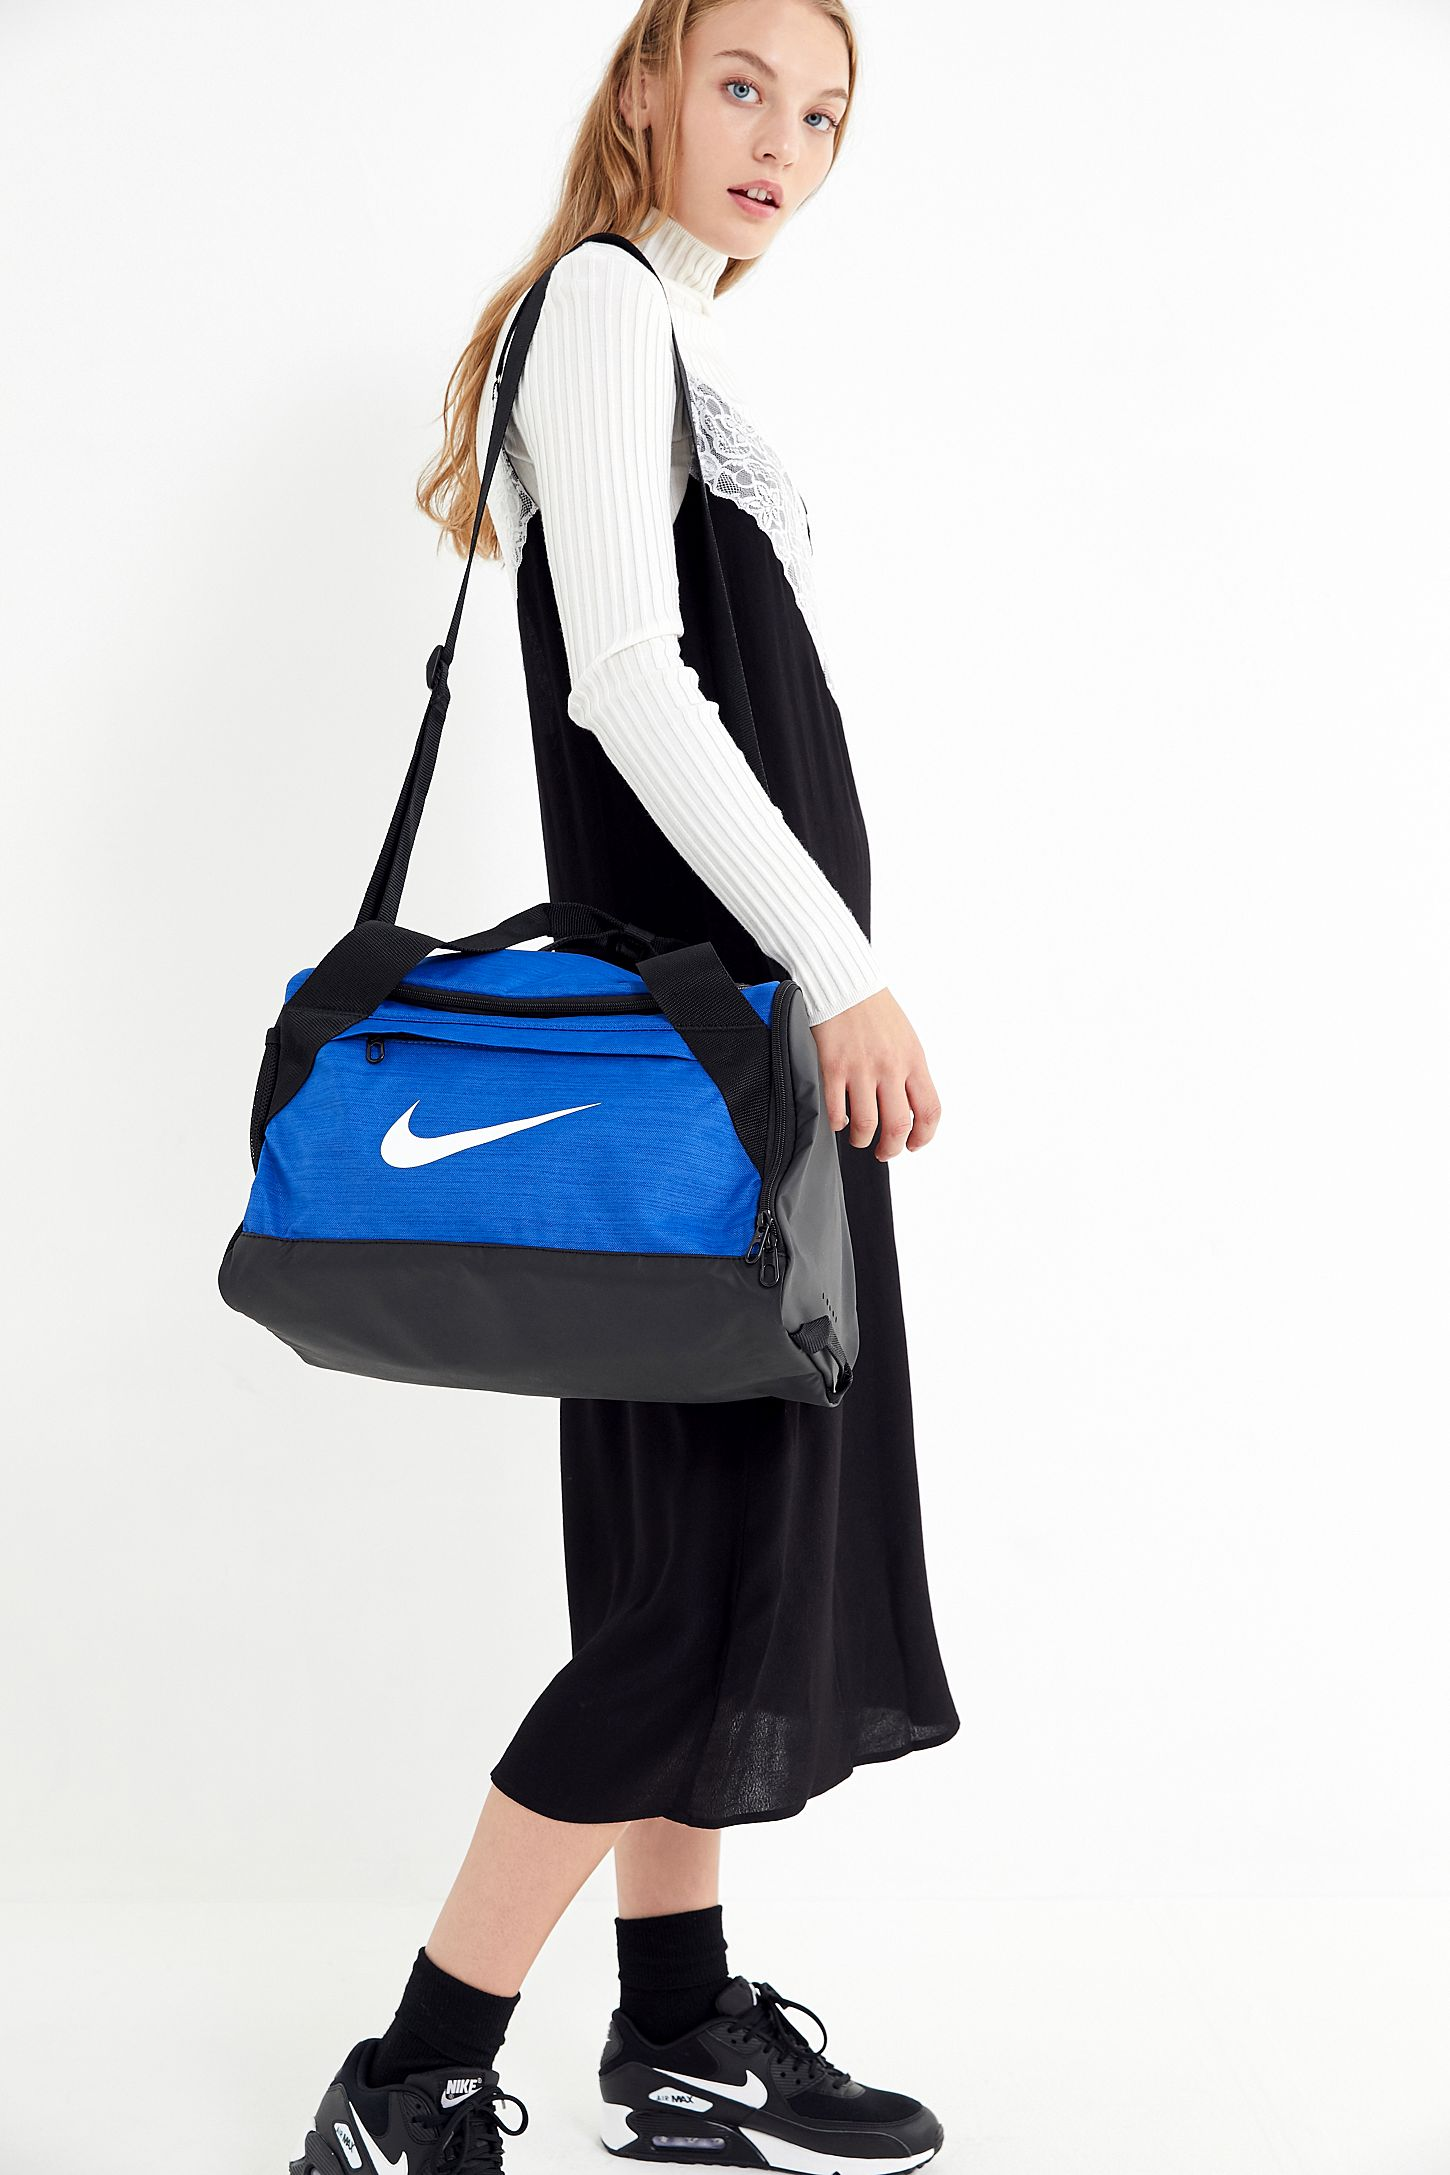 1a3751119680 Nike Brasilia Small Duffle Bag